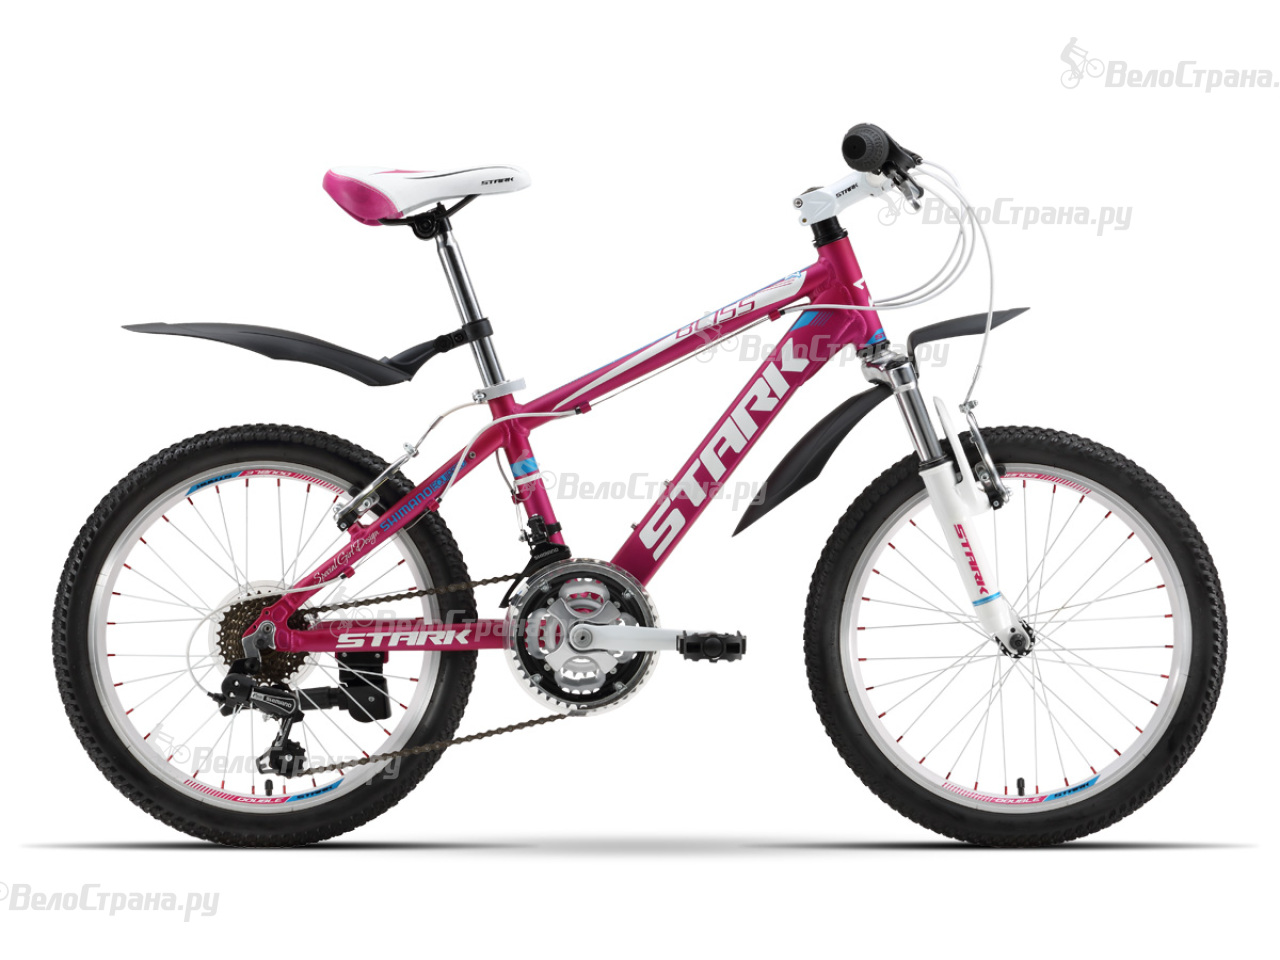 Велосипед Stark Bliss Girl 20 (2016) велосипед stark gravity 20 2016